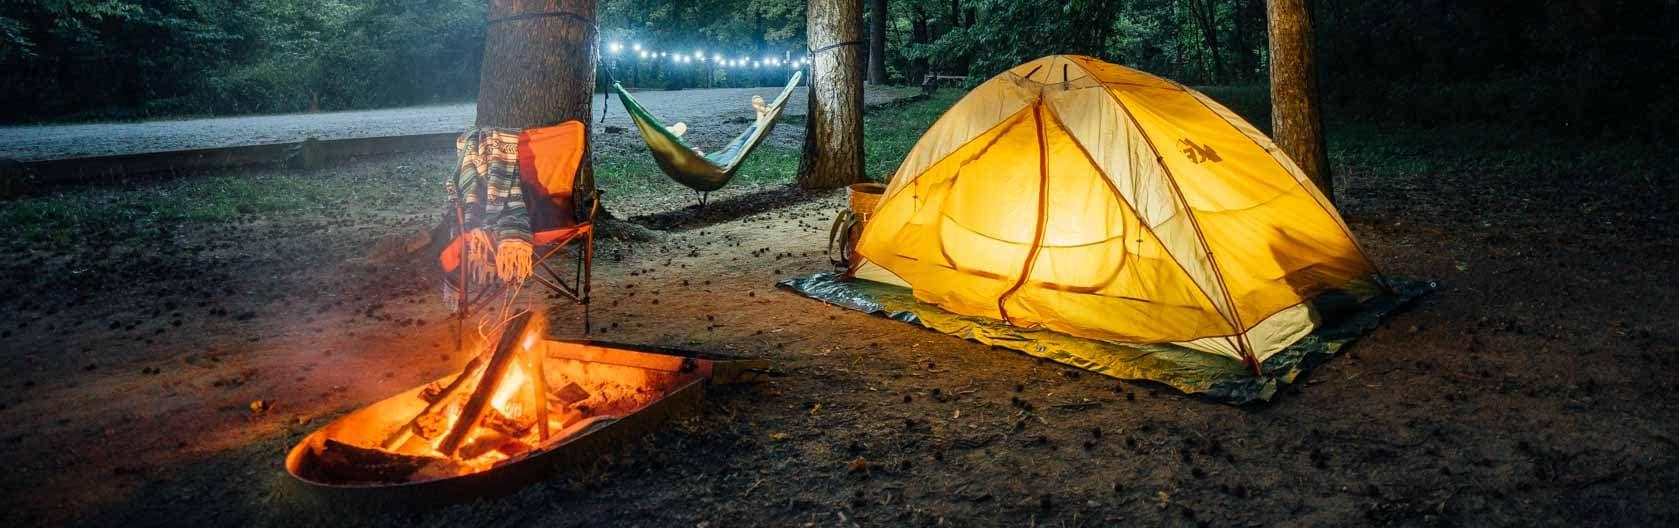 Camper at Kyles Landing campground.